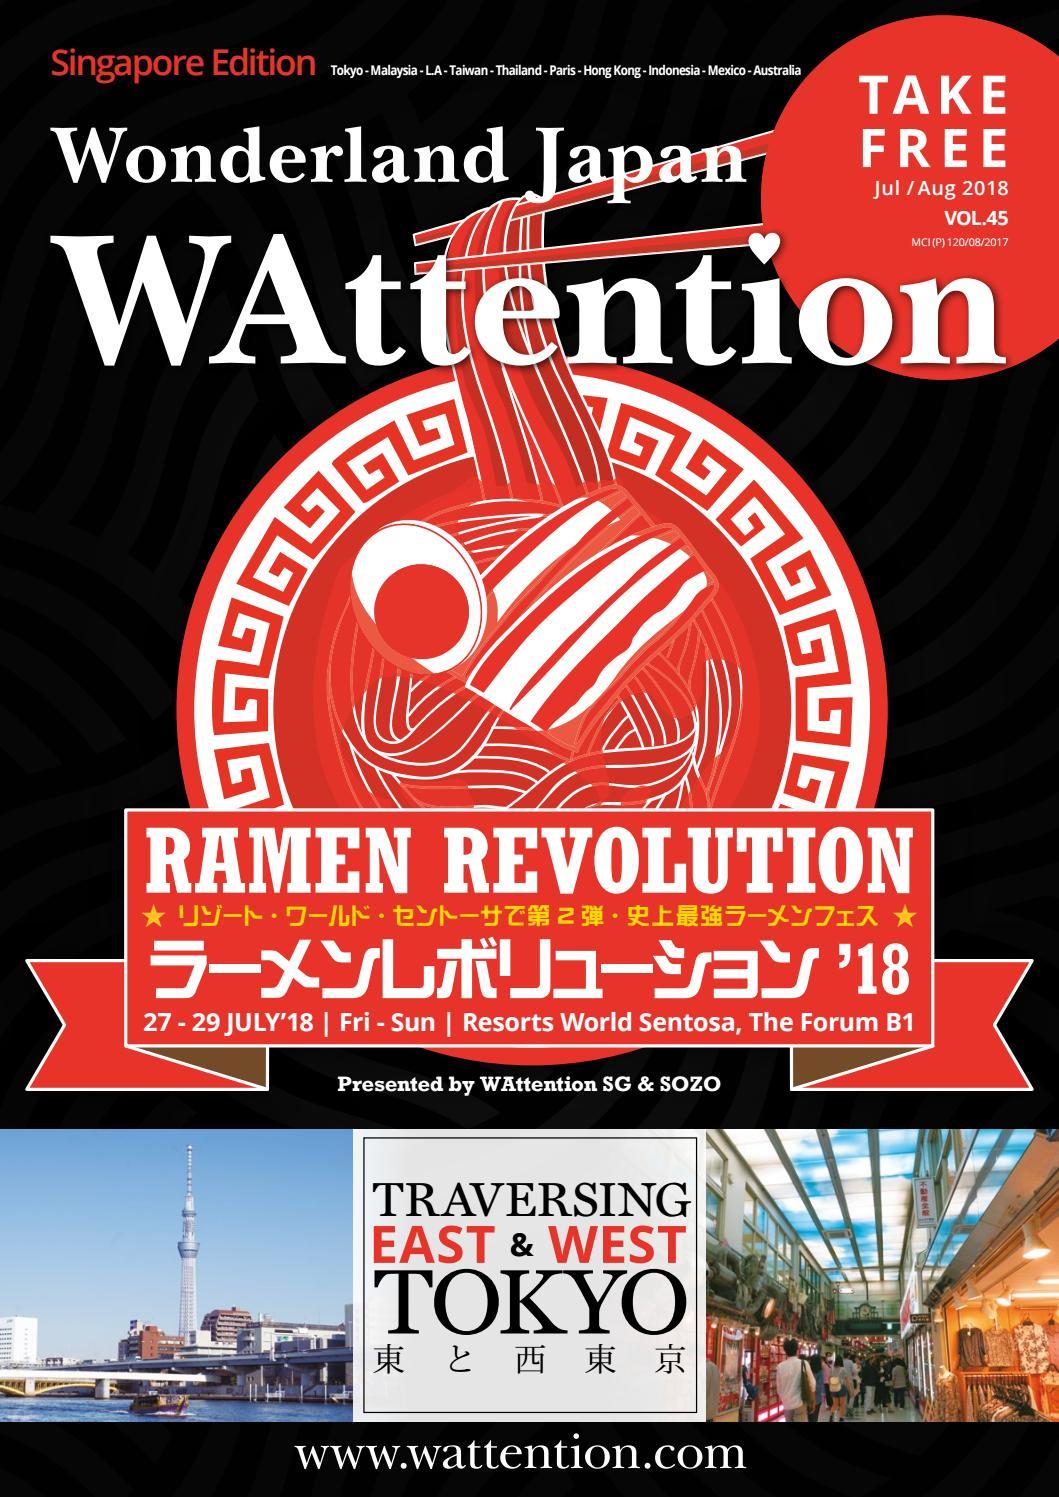 WAttention Singapore Vol  45 by WAttention - issuu